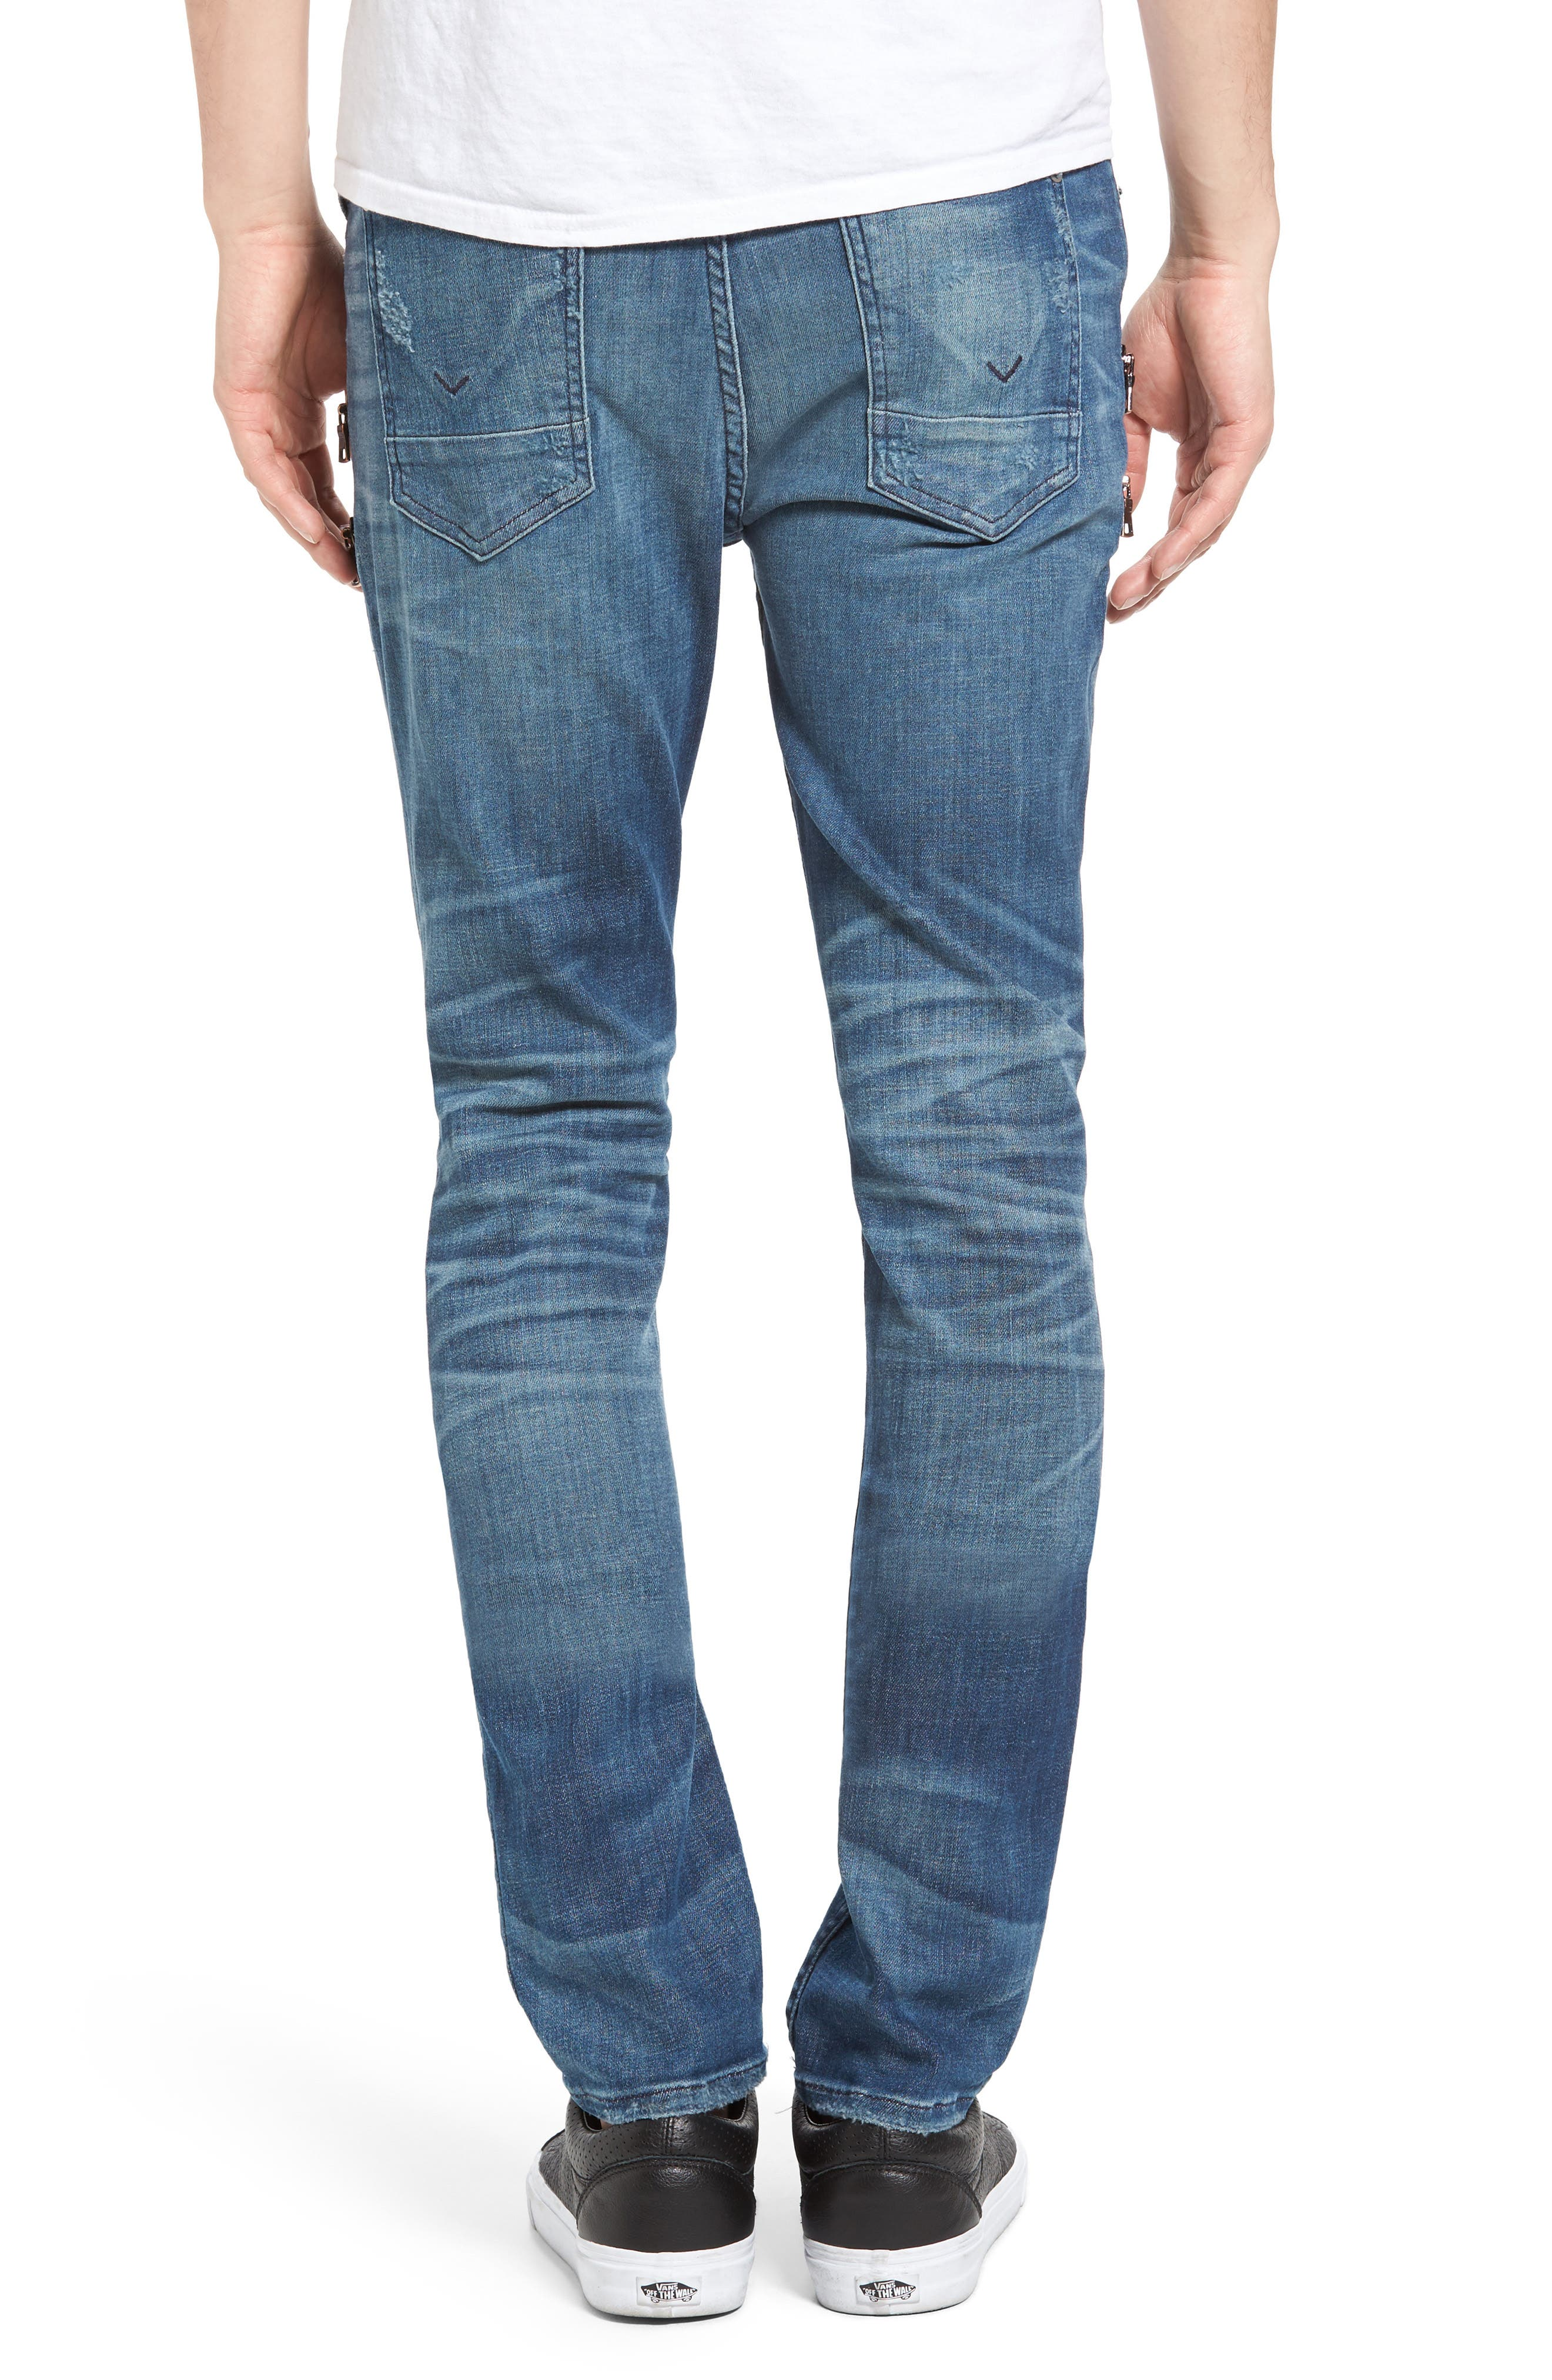 Broderick Biker Skinny Fit Jeans,                             Alternate thumbnail 2, color,                             Hayday 2